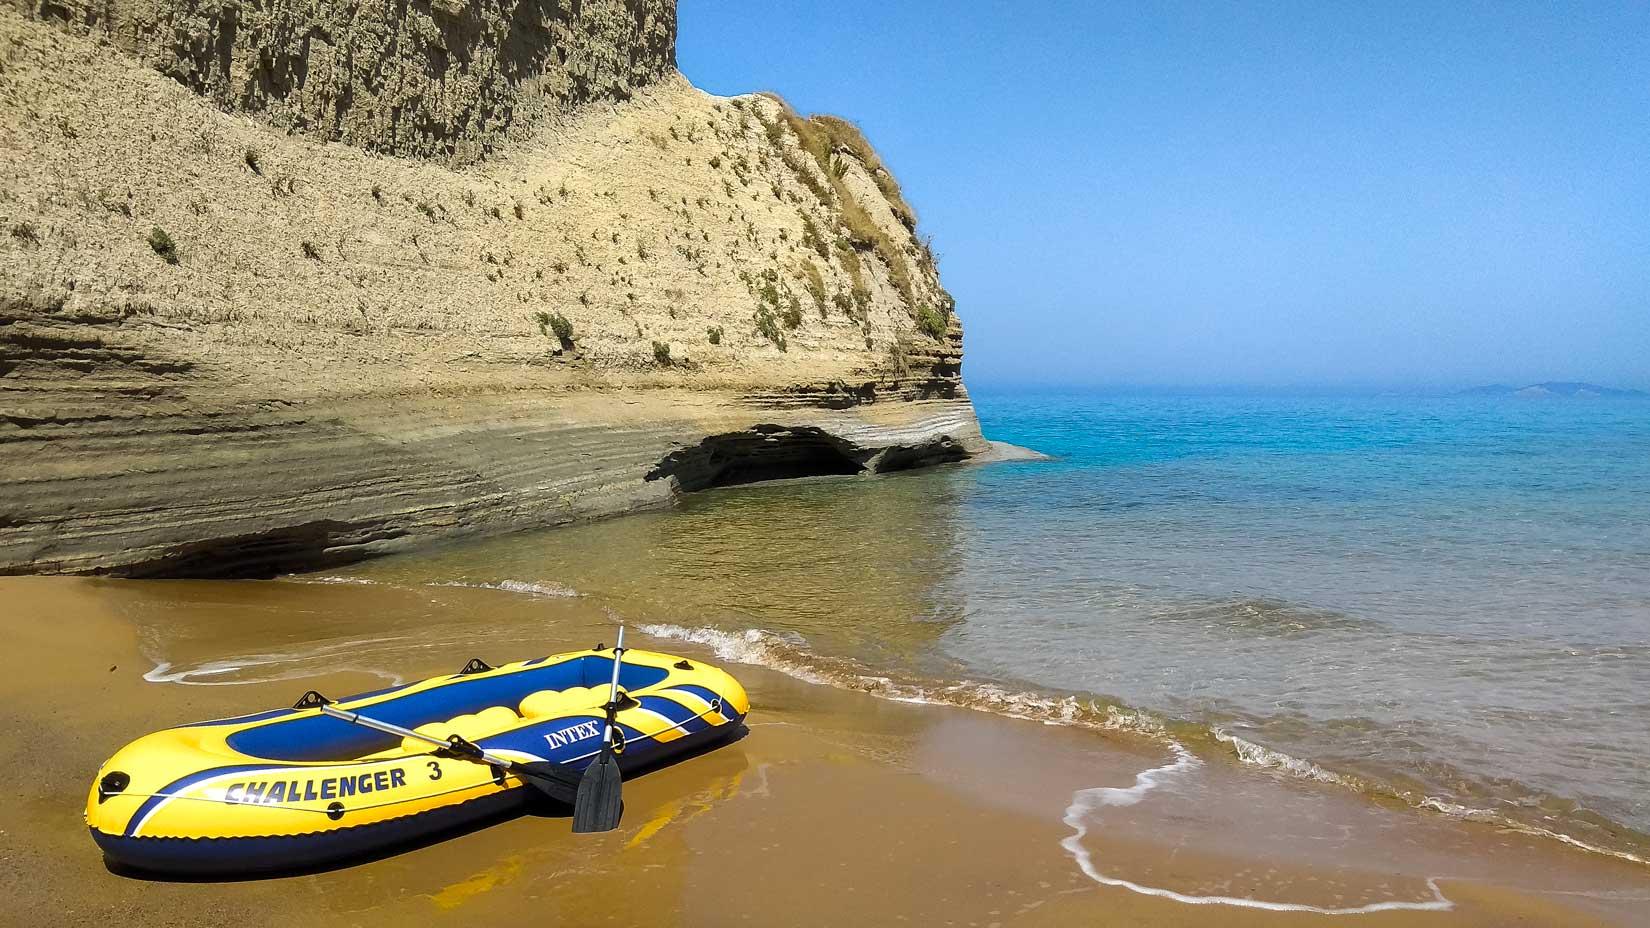 Jedna z úchvatných pláží pod strmým útesem mysu Drastis. Stačí málo - vzít si do auta člun a zaveslovat si na ni...